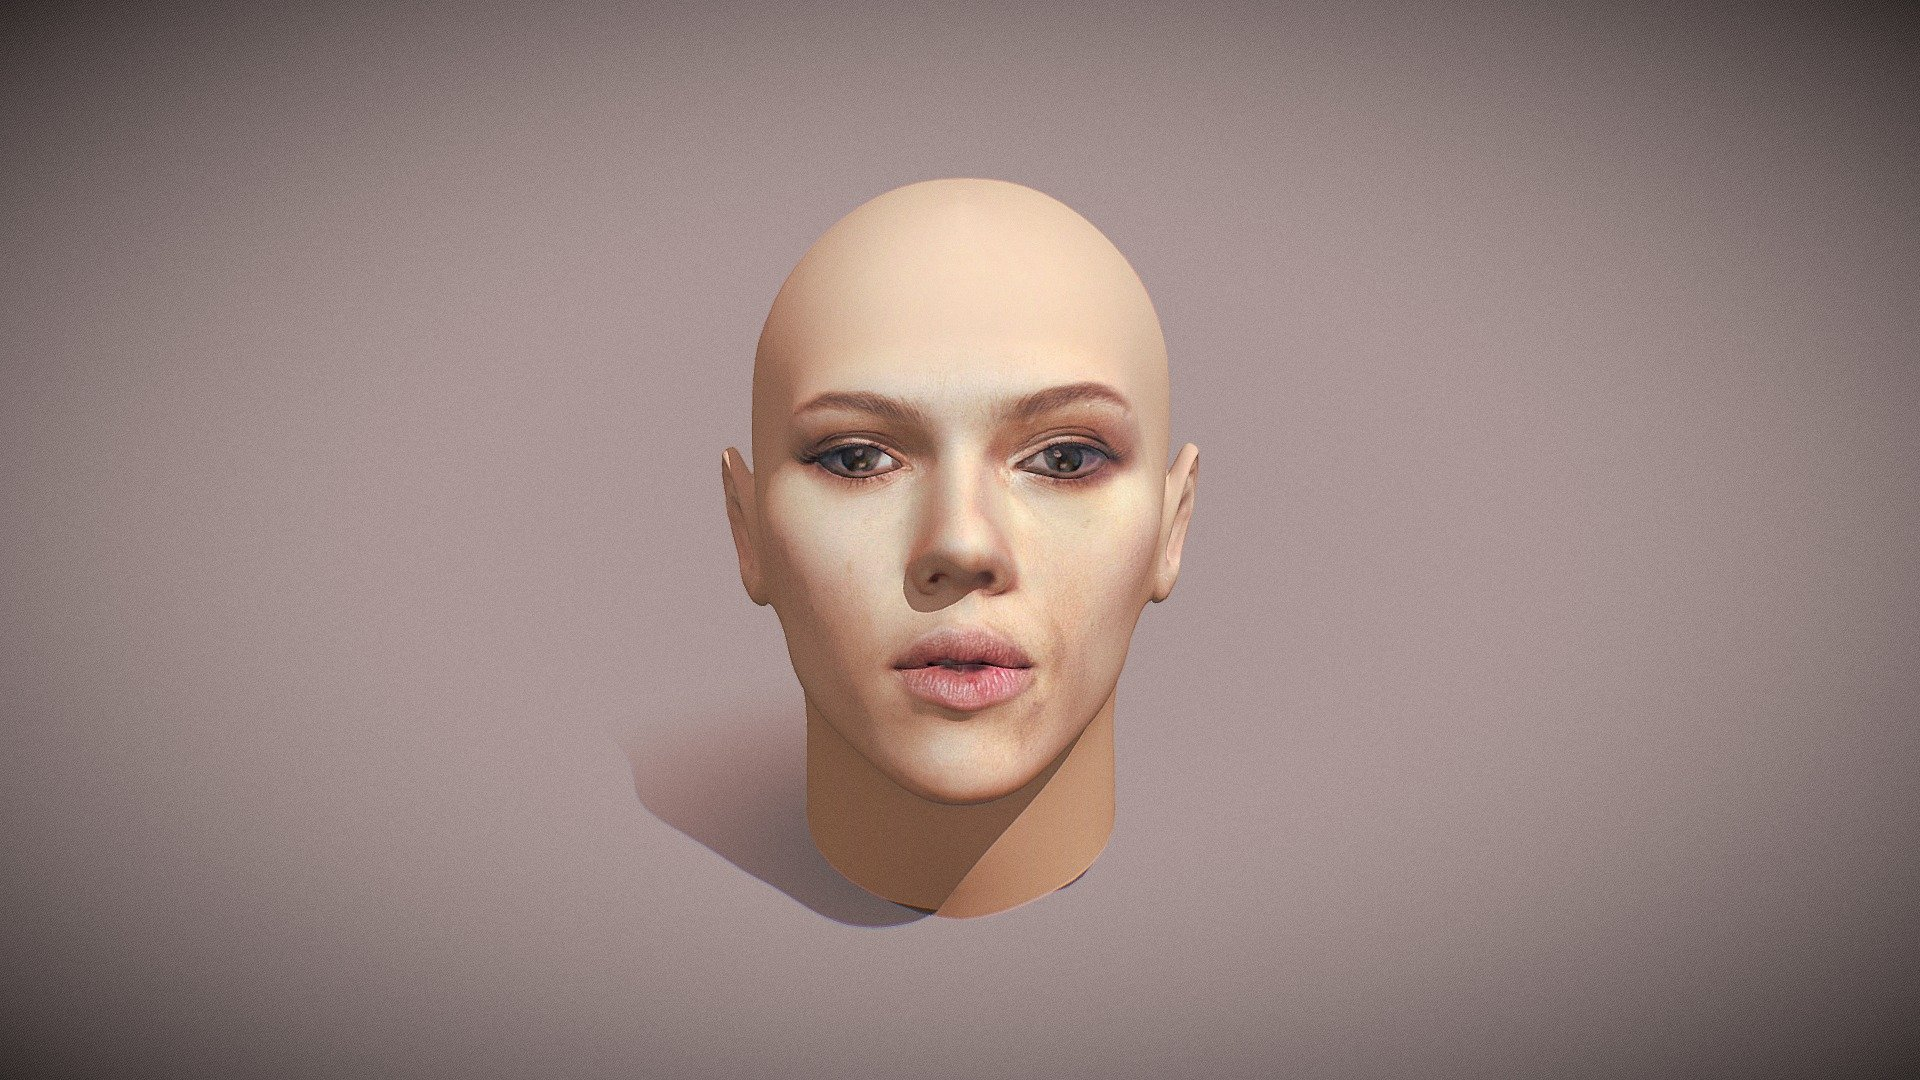 Scarlett Johansson 3d Head Face Download Free 3d Model By Leon Primer Heybabywasgeht Dc3812a Sketchfab